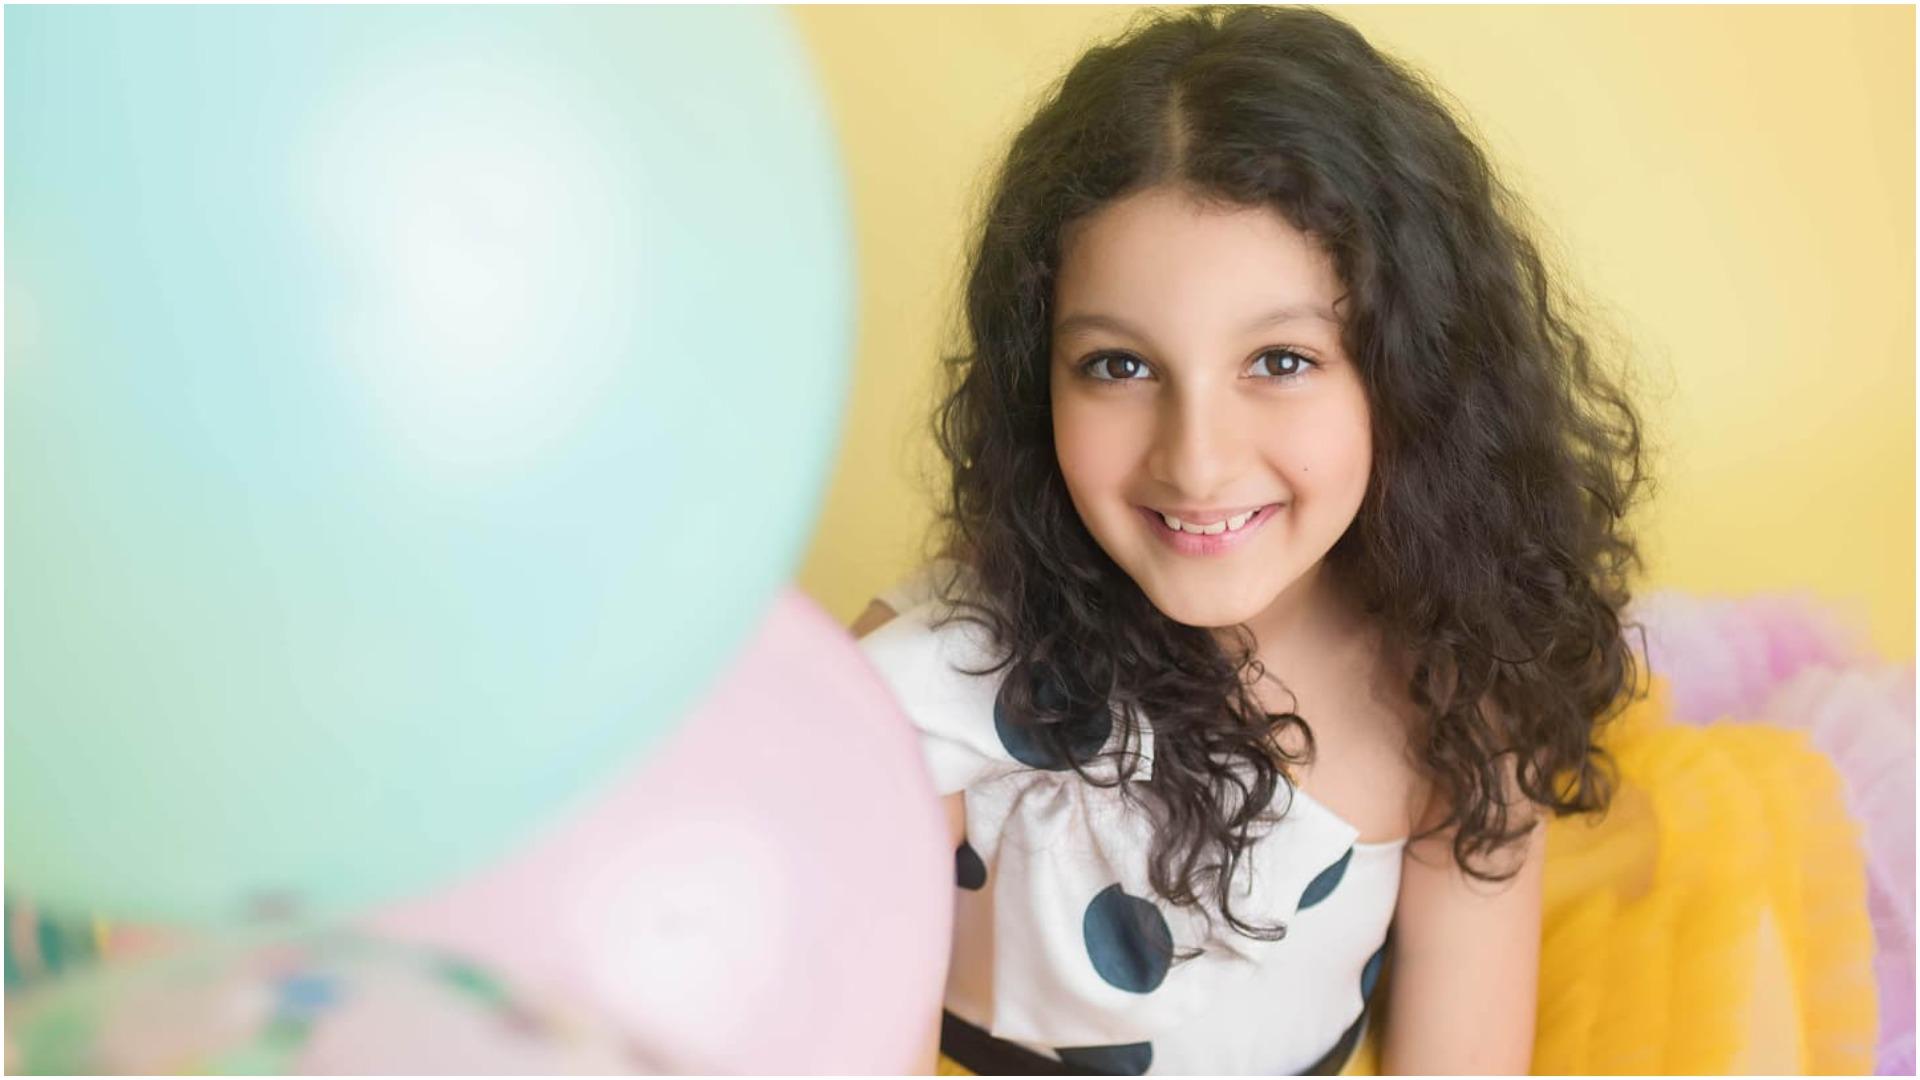 Sitara, Mahesh Babu's daughter, makes her acting debut in Thalipathy66